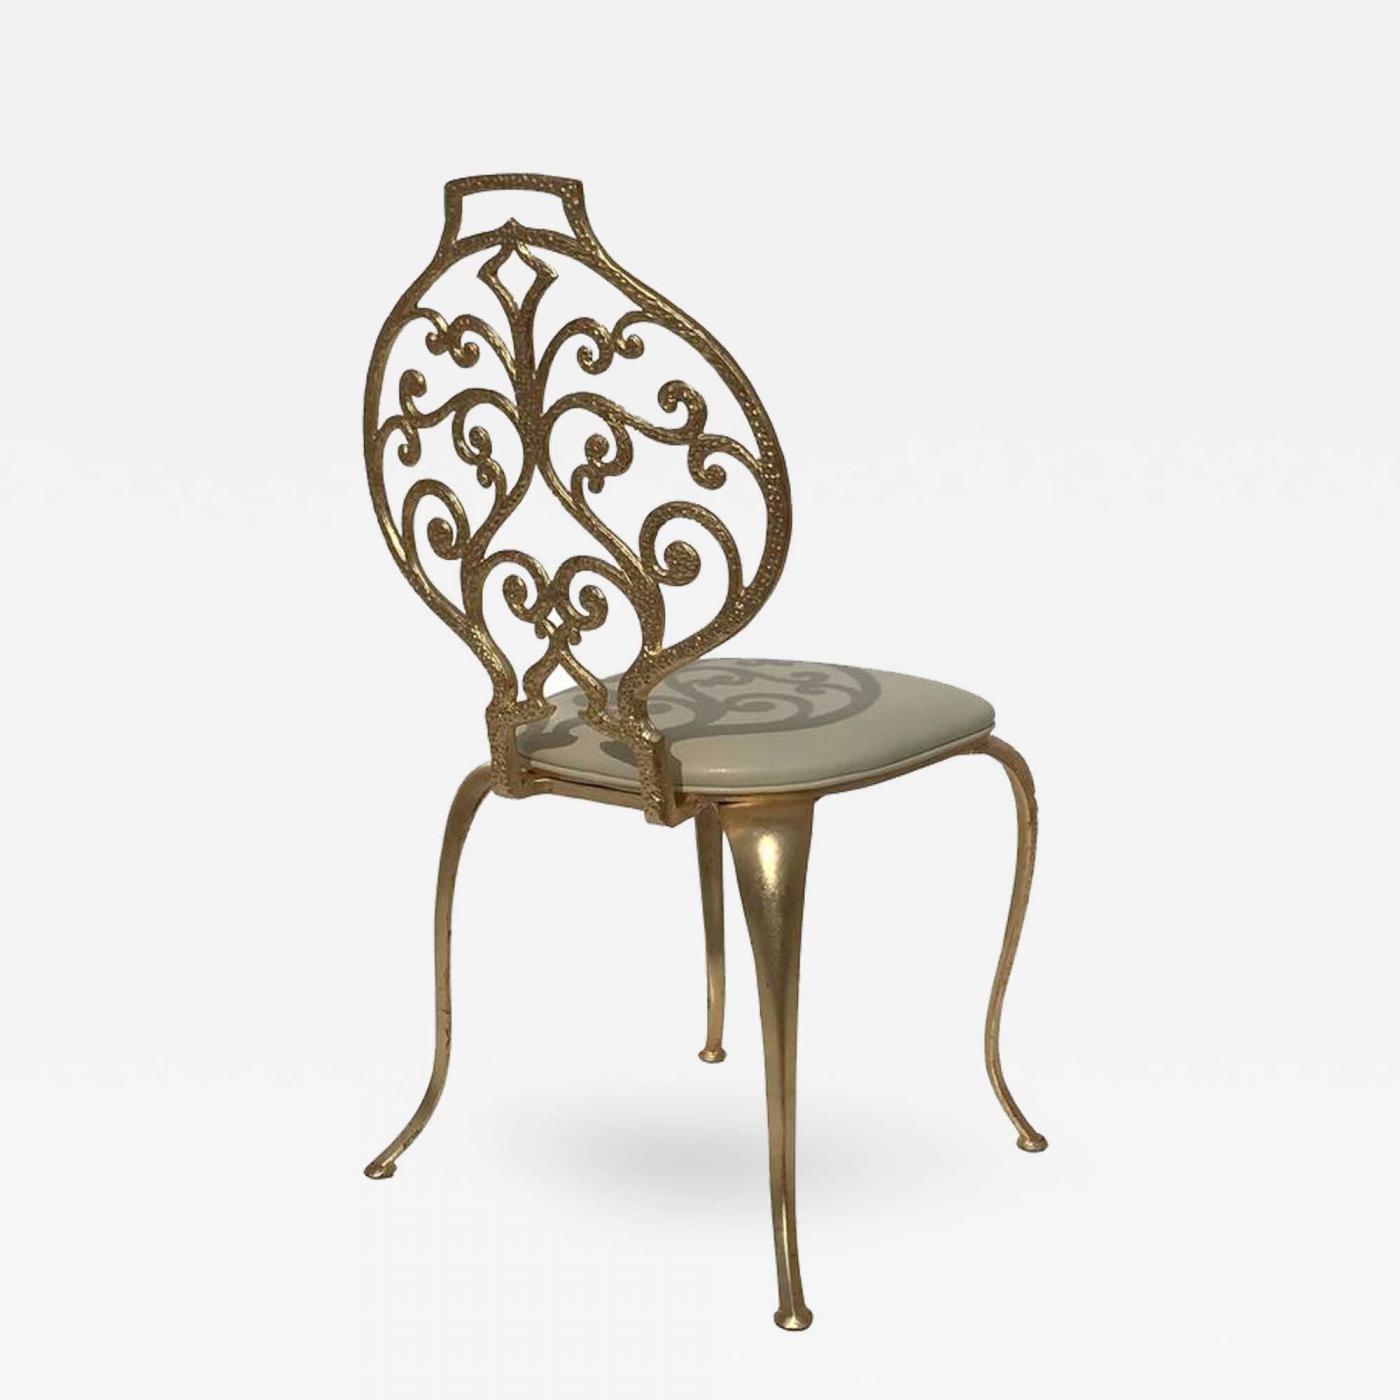 Thinline Gold Leafed Vanity Chair By Thinline Mfg